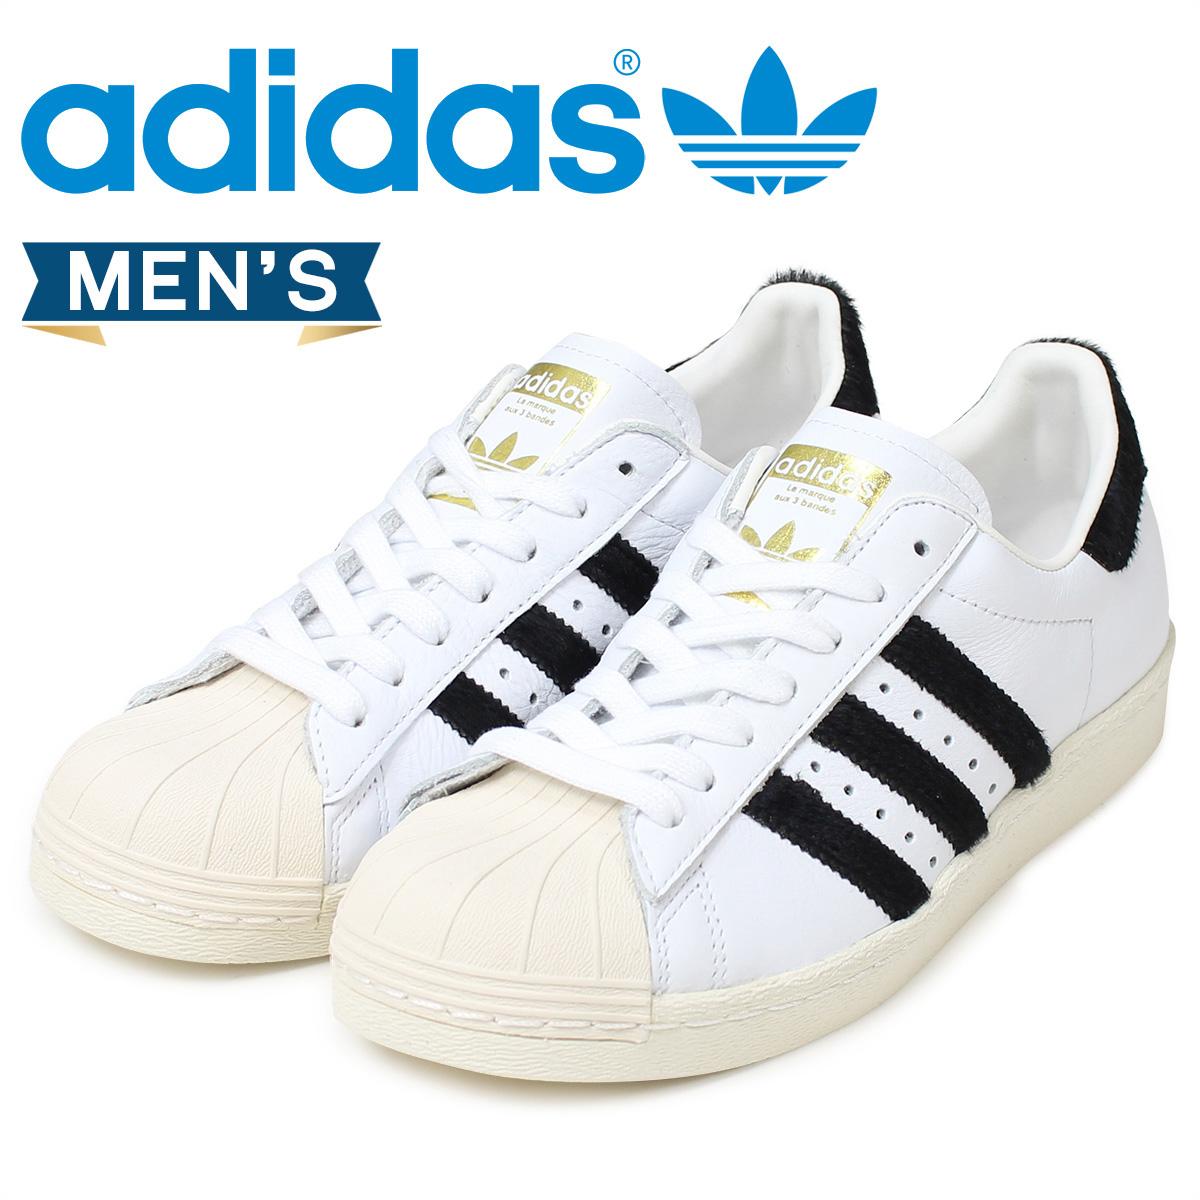 Adidas originals superstar 80s adidas Originals